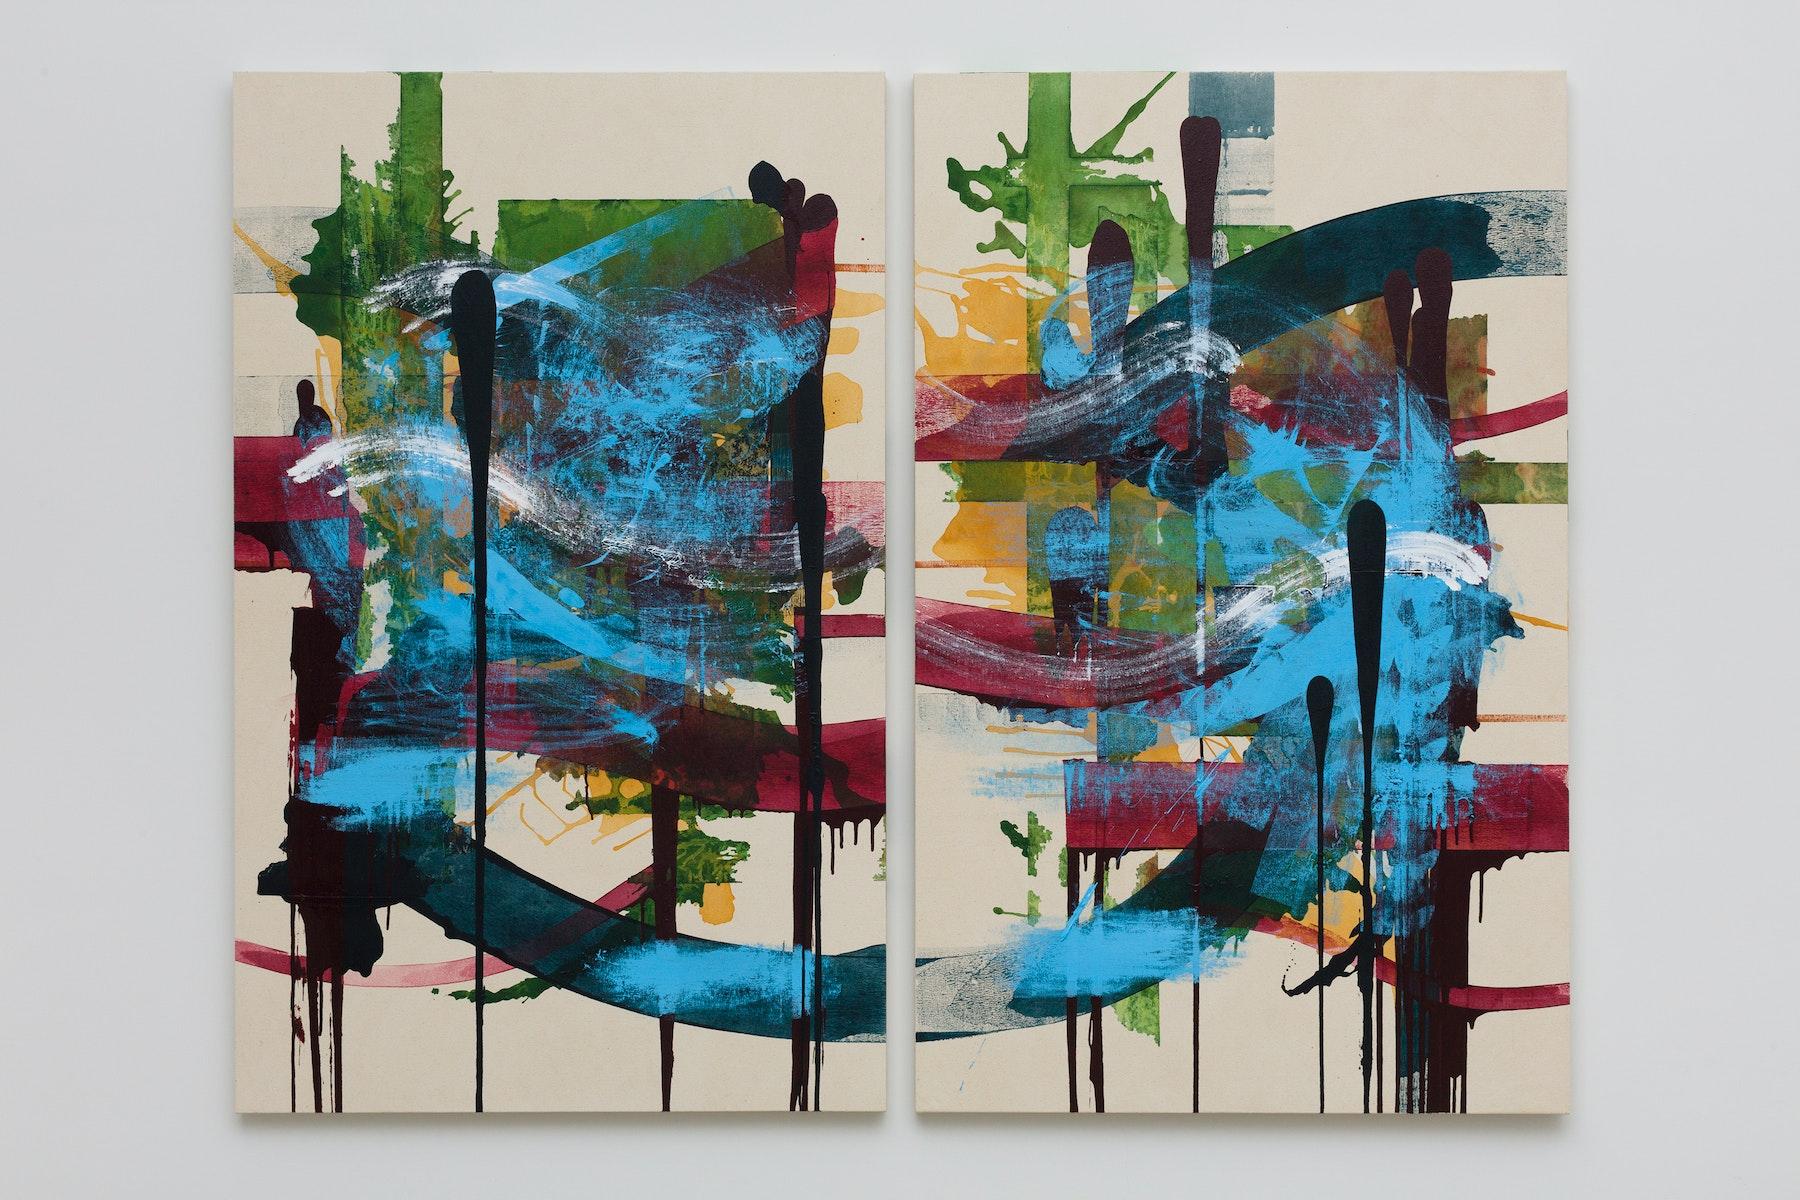 "Elizabeth Neel ""Down Boy Blue,"" 2019 Acrylic on canvas Diptych, Each 72 x 45"" [HxW] (182.88 x 114.3 cm) Inventory #NEE236 Courtesy of the artist and Vielmetter Los Angeles Photo credit: Jeff McLane"